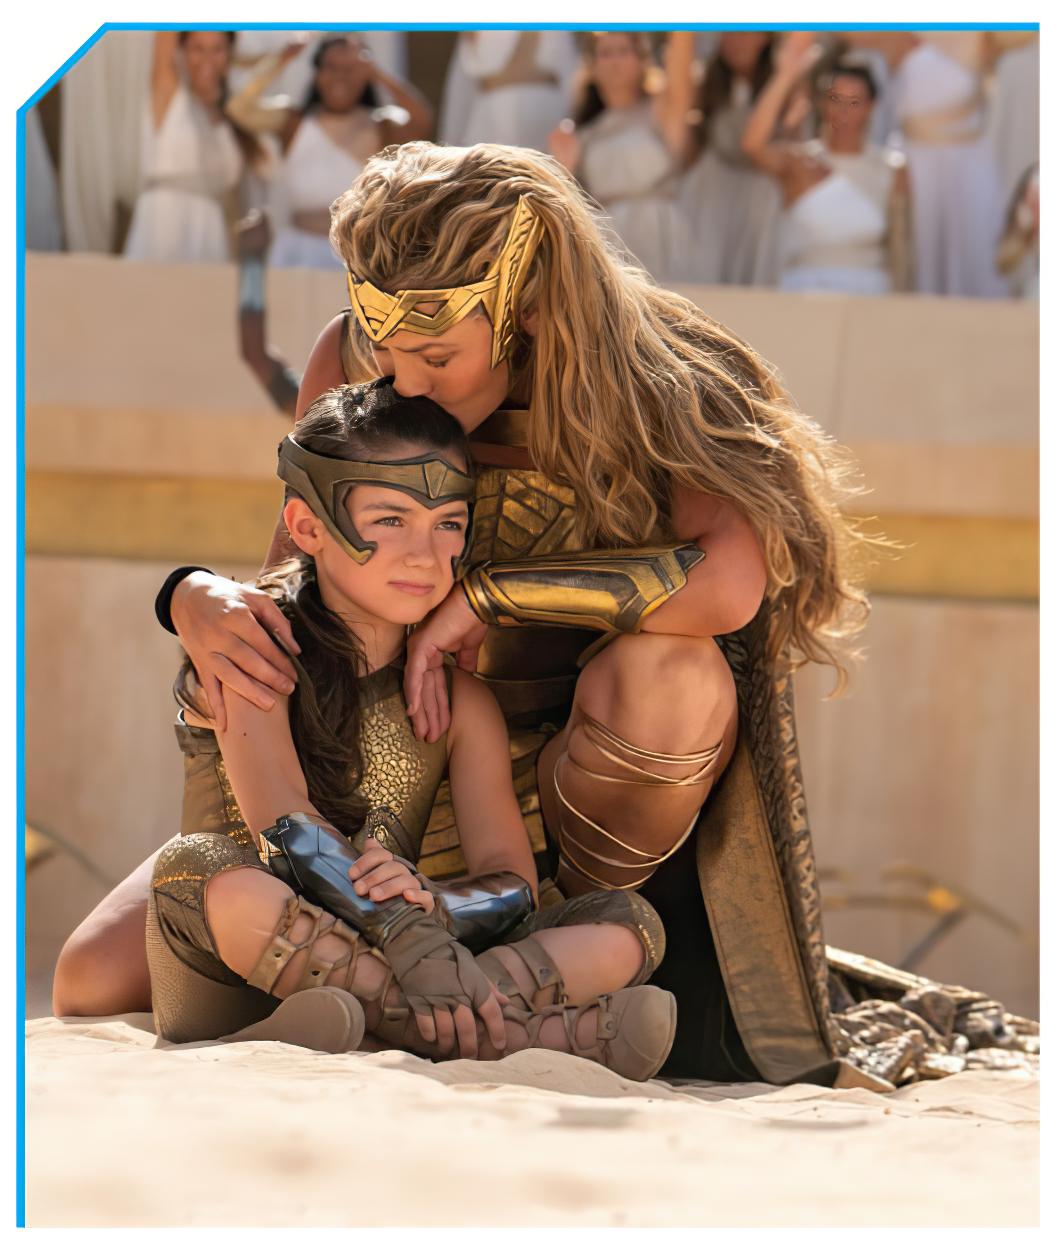 La Reina Hipólita (Connie Nielsen) y la joven Princesa Diana (Lilly Aspell) en Wonder Woman 1984 (2020). Imagen: Bleeding Cool